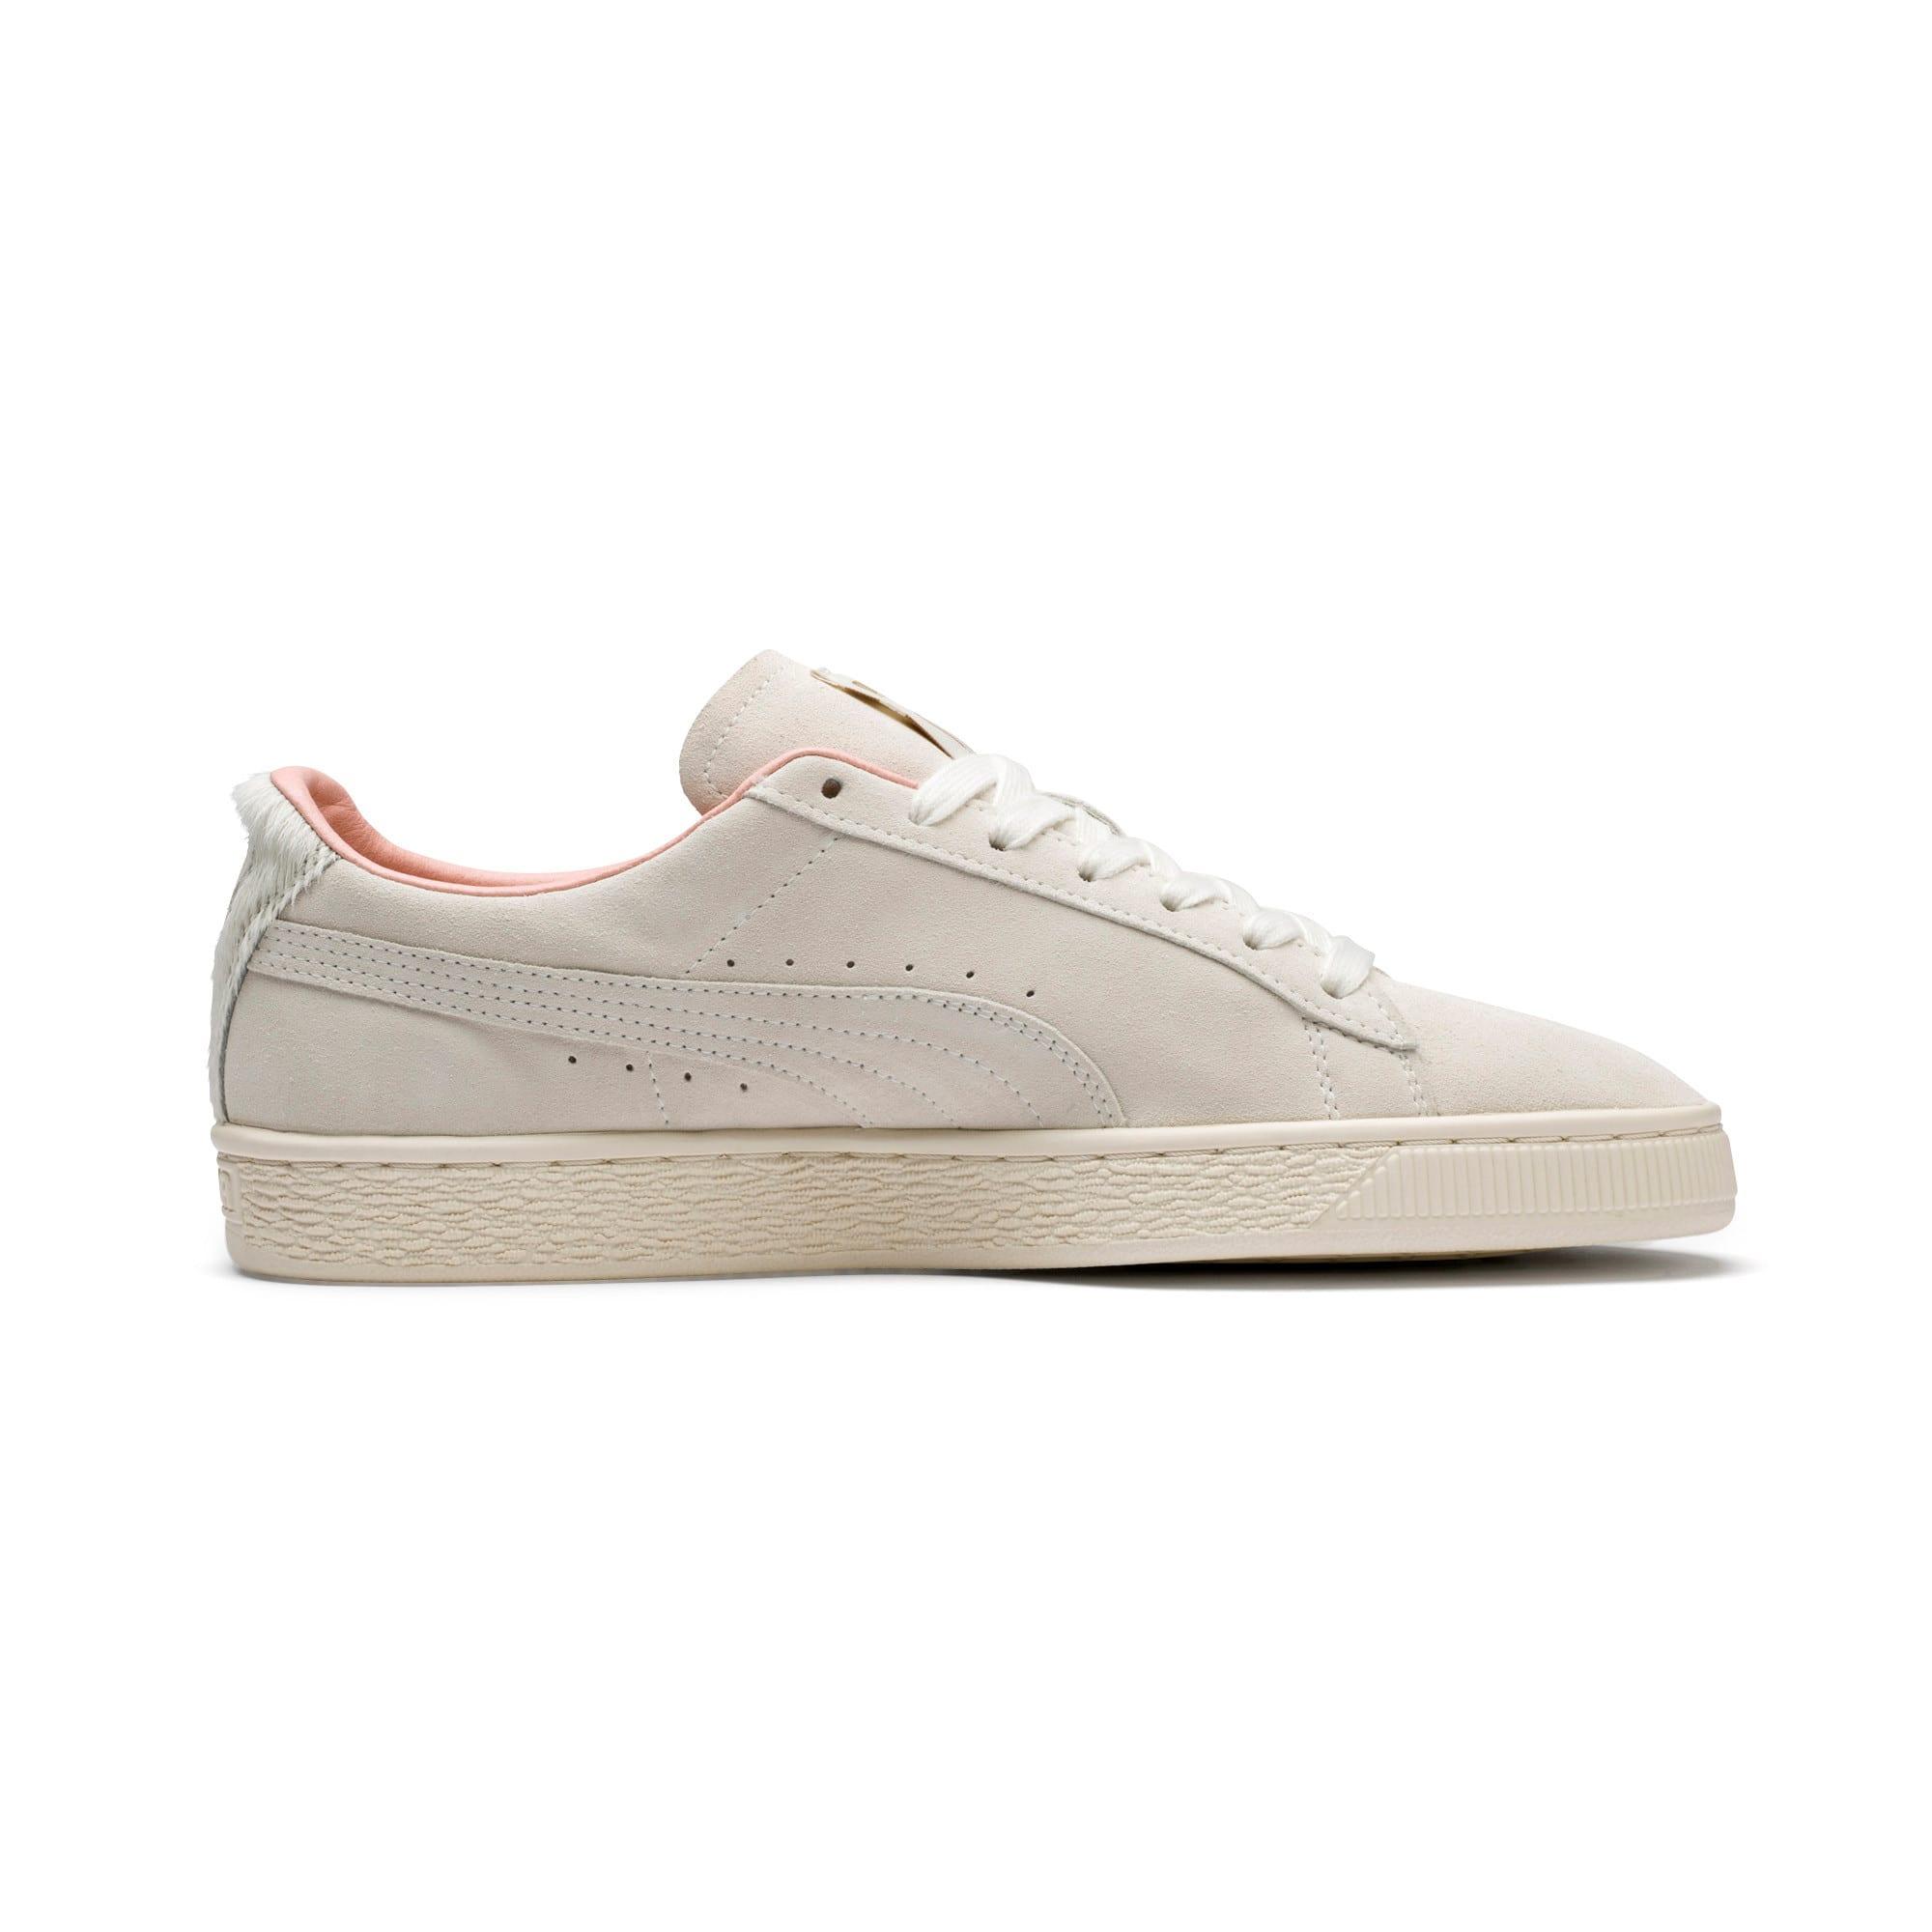 Thumbnail 5 of Suede Classic Easter Sneakers, Whisper White-Whisper White, medium